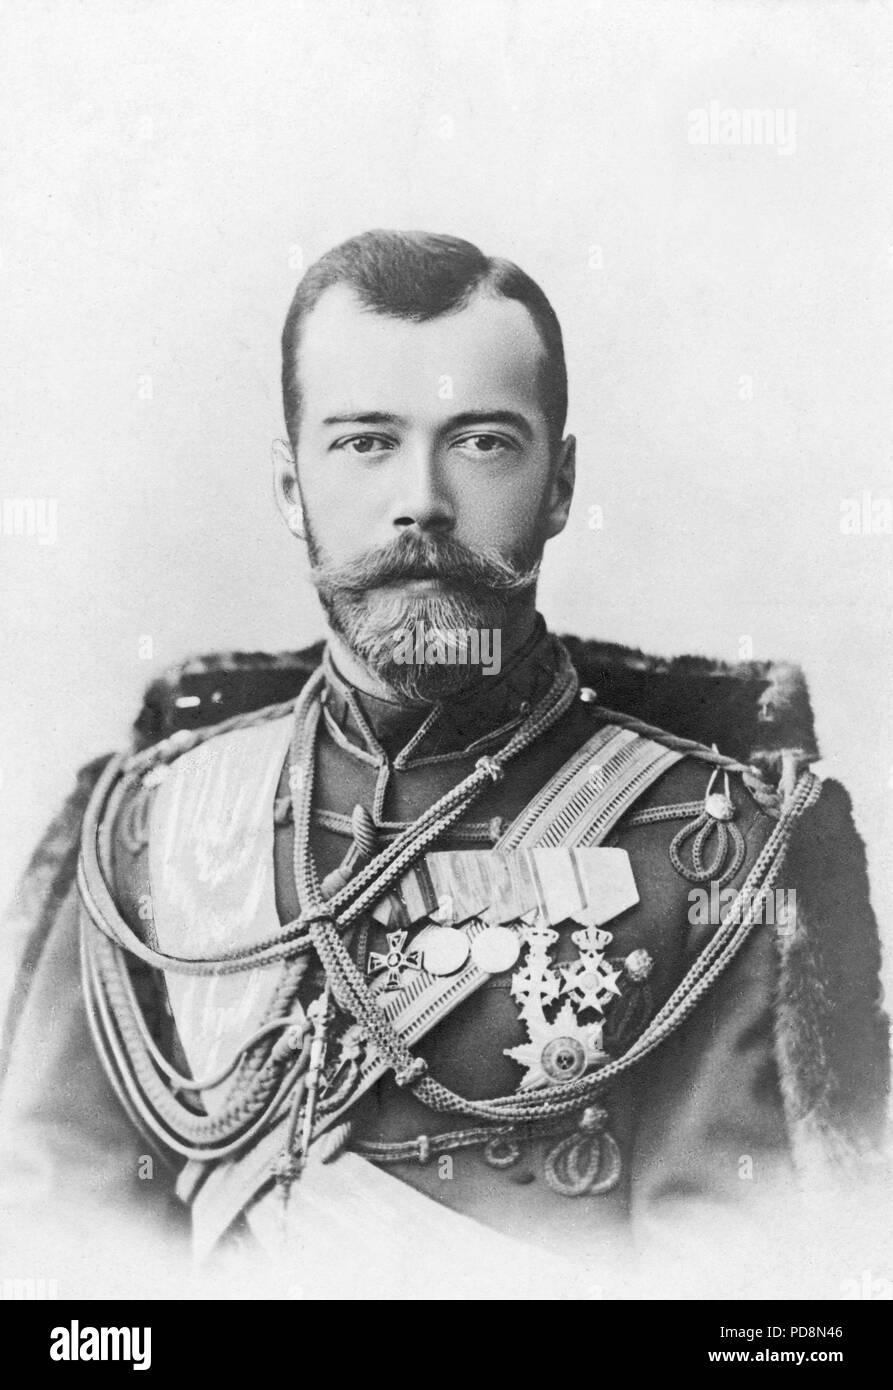 Tsar Nicholas Ii Of RussiaStock Photos and Images